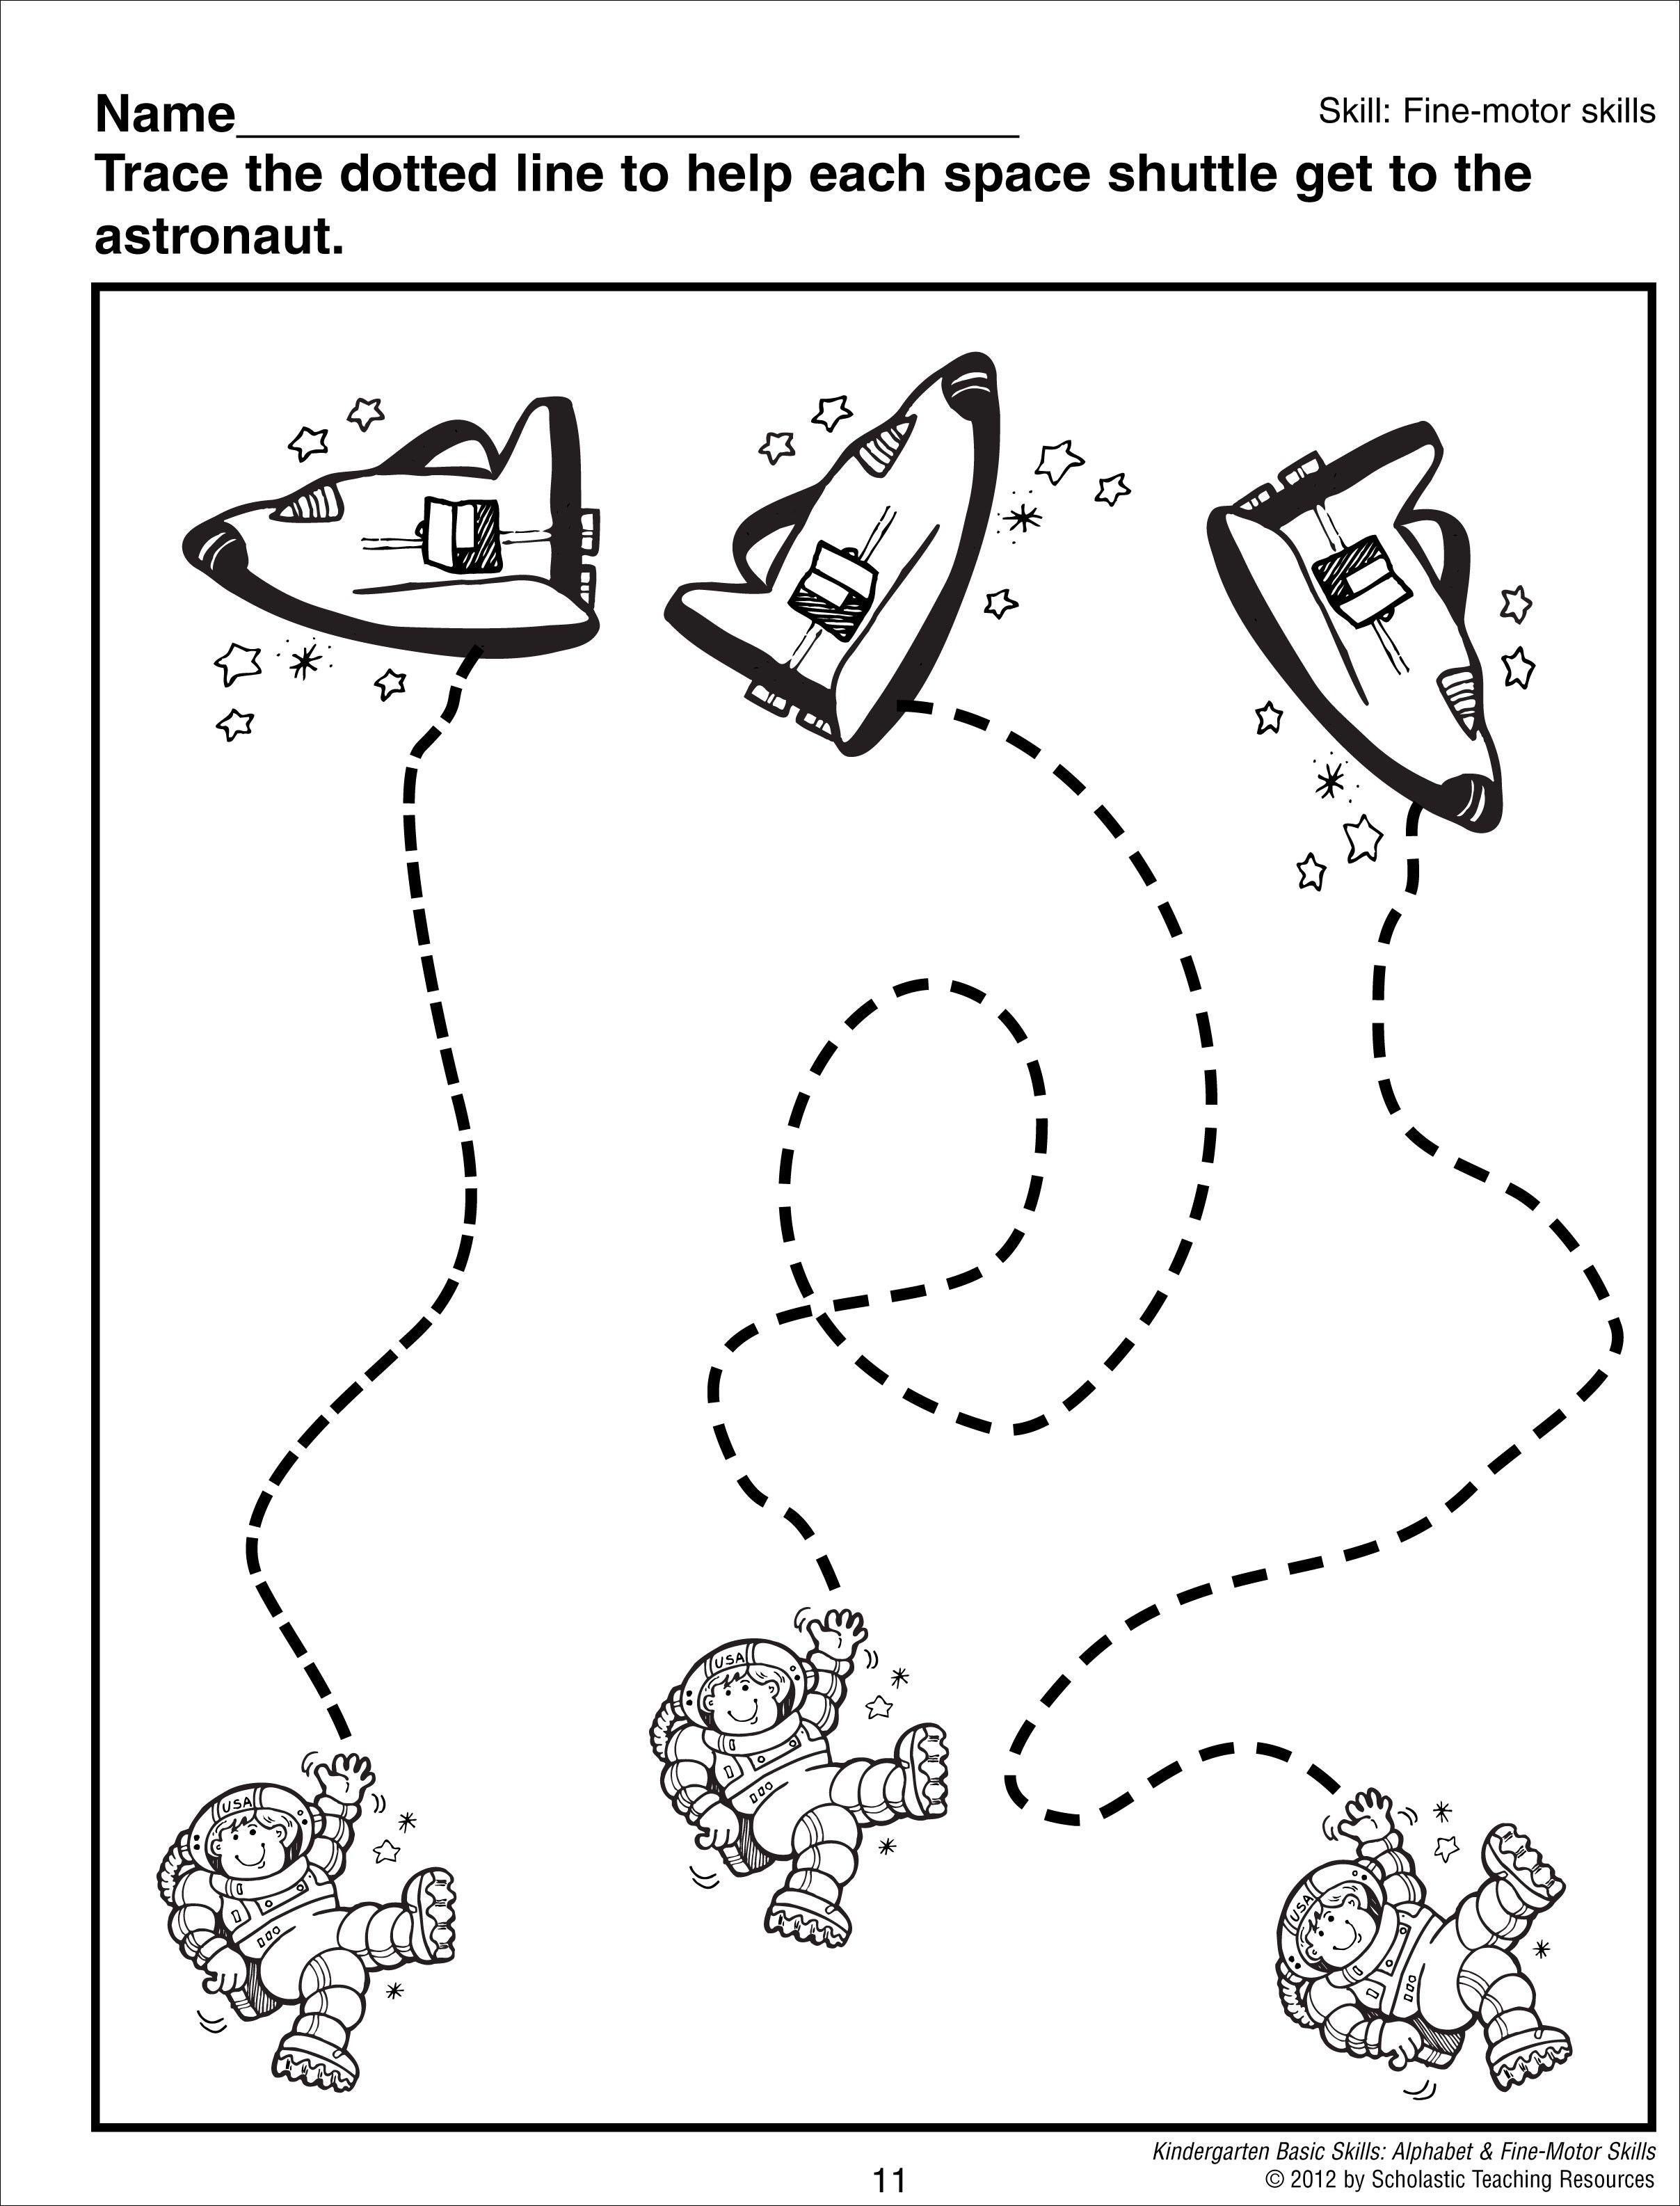 Pin By Mariaha Patlan On Thema Ruimte Kleuters Theme Space Planets Preschool Astronaute De L Espace Maternelle Space Theme Preschool Preschool Tracing Space Preschool [ 3171 x 2415 Pixel ]